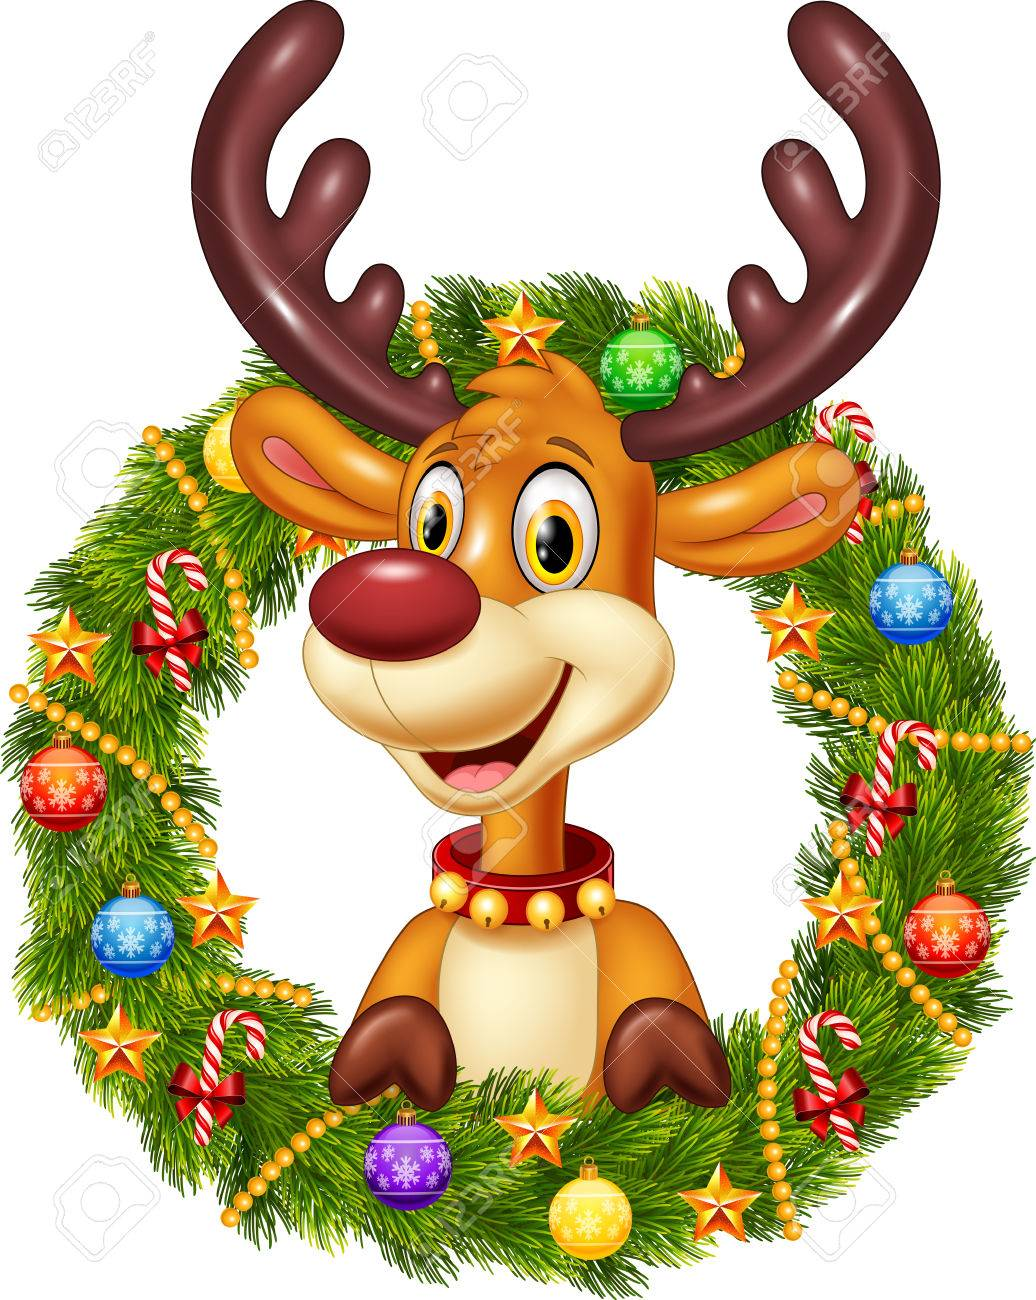 Vector Illustration Of Cartoon Funny Deer Holding Christmas Wreath